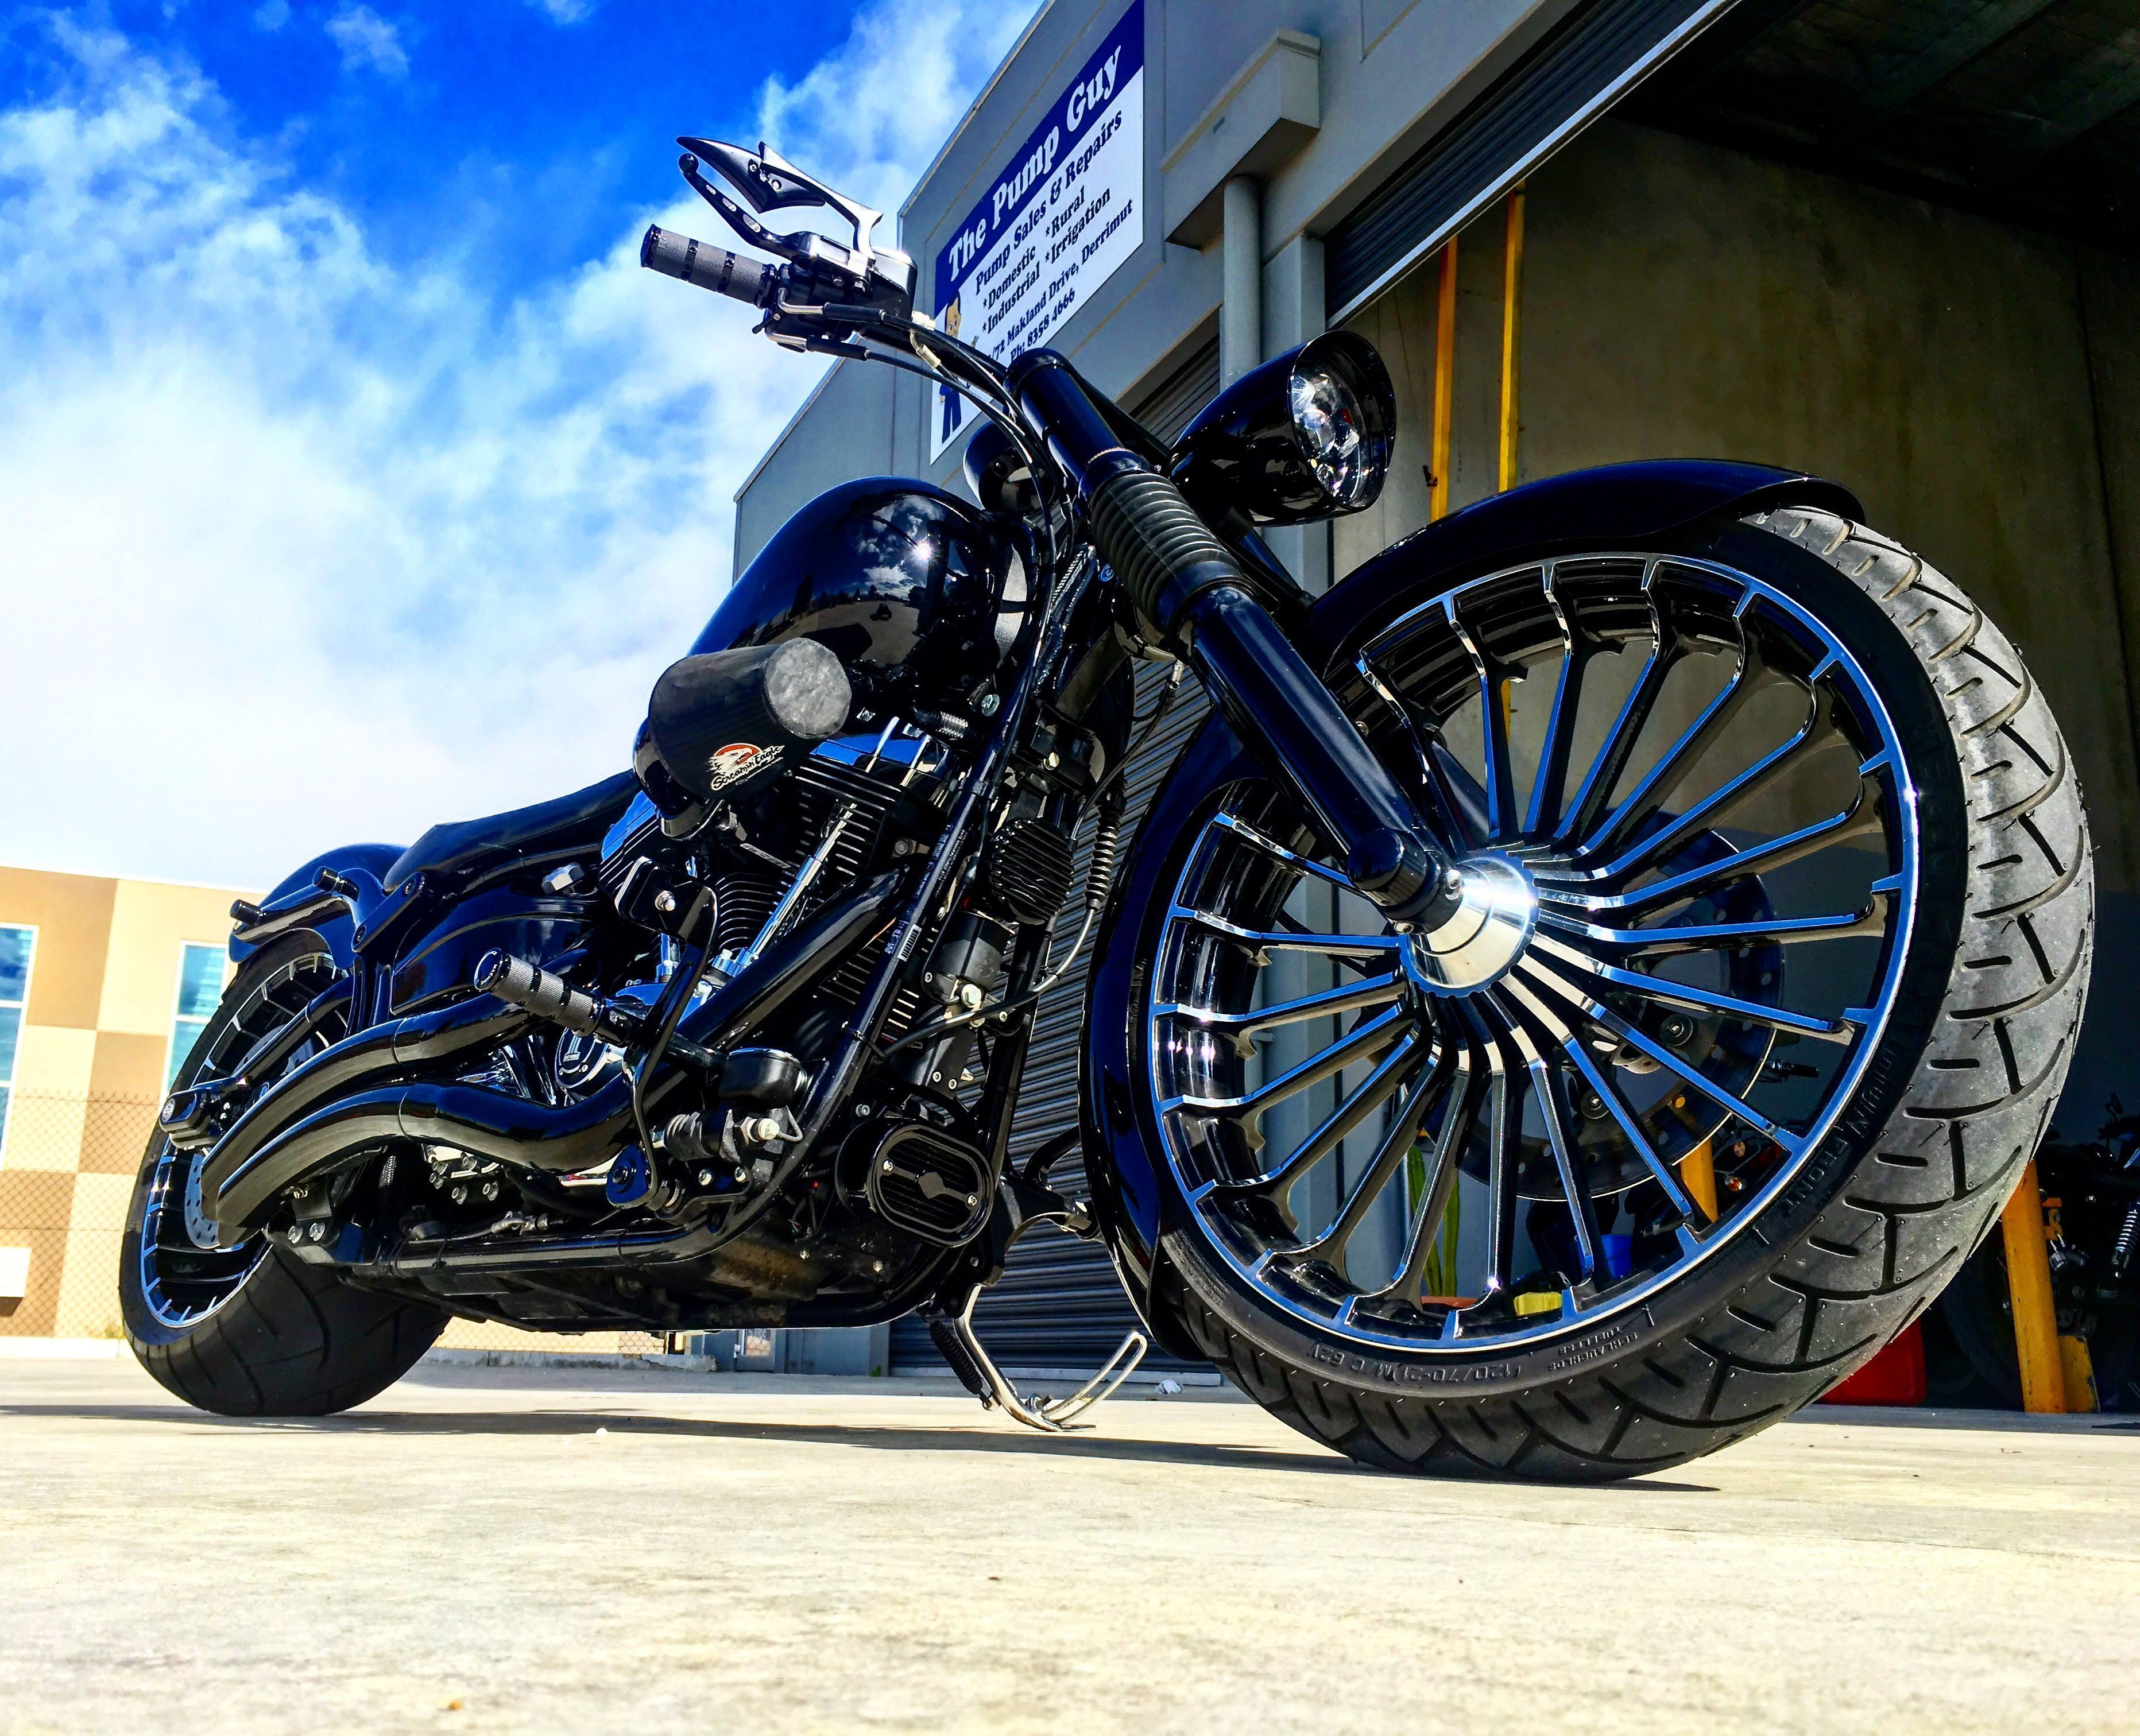 2013 Harley Davidson Breakout Recently Finished By Us Cvo Wheels 255 Screamin Eagle C Harley Davidson Motorcycles Harley Davidson Bikes Harley Davidson Model